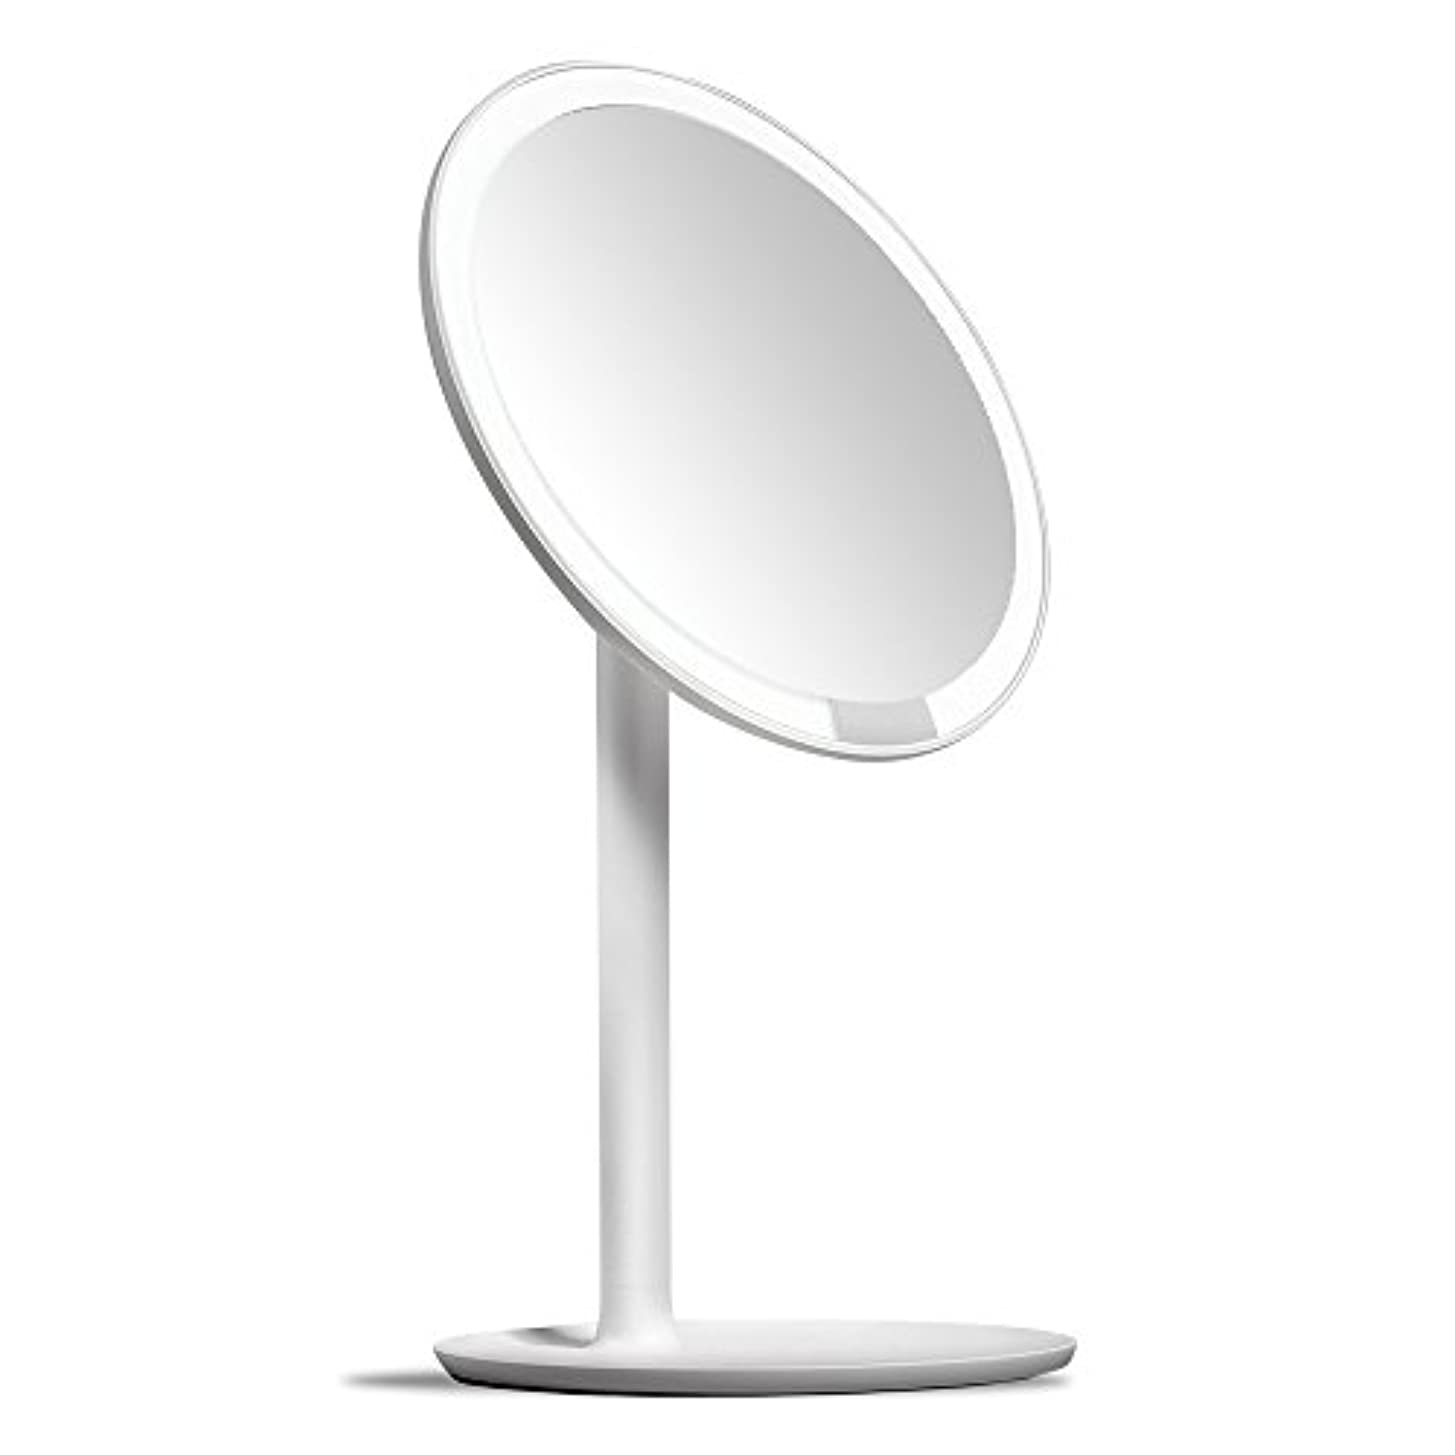 AMIRO 化粧鏡 化粧ミラー LEDライト付き 卓上鏡 女優ミラー 3段階明るさ調節可能 コードレス 充電式